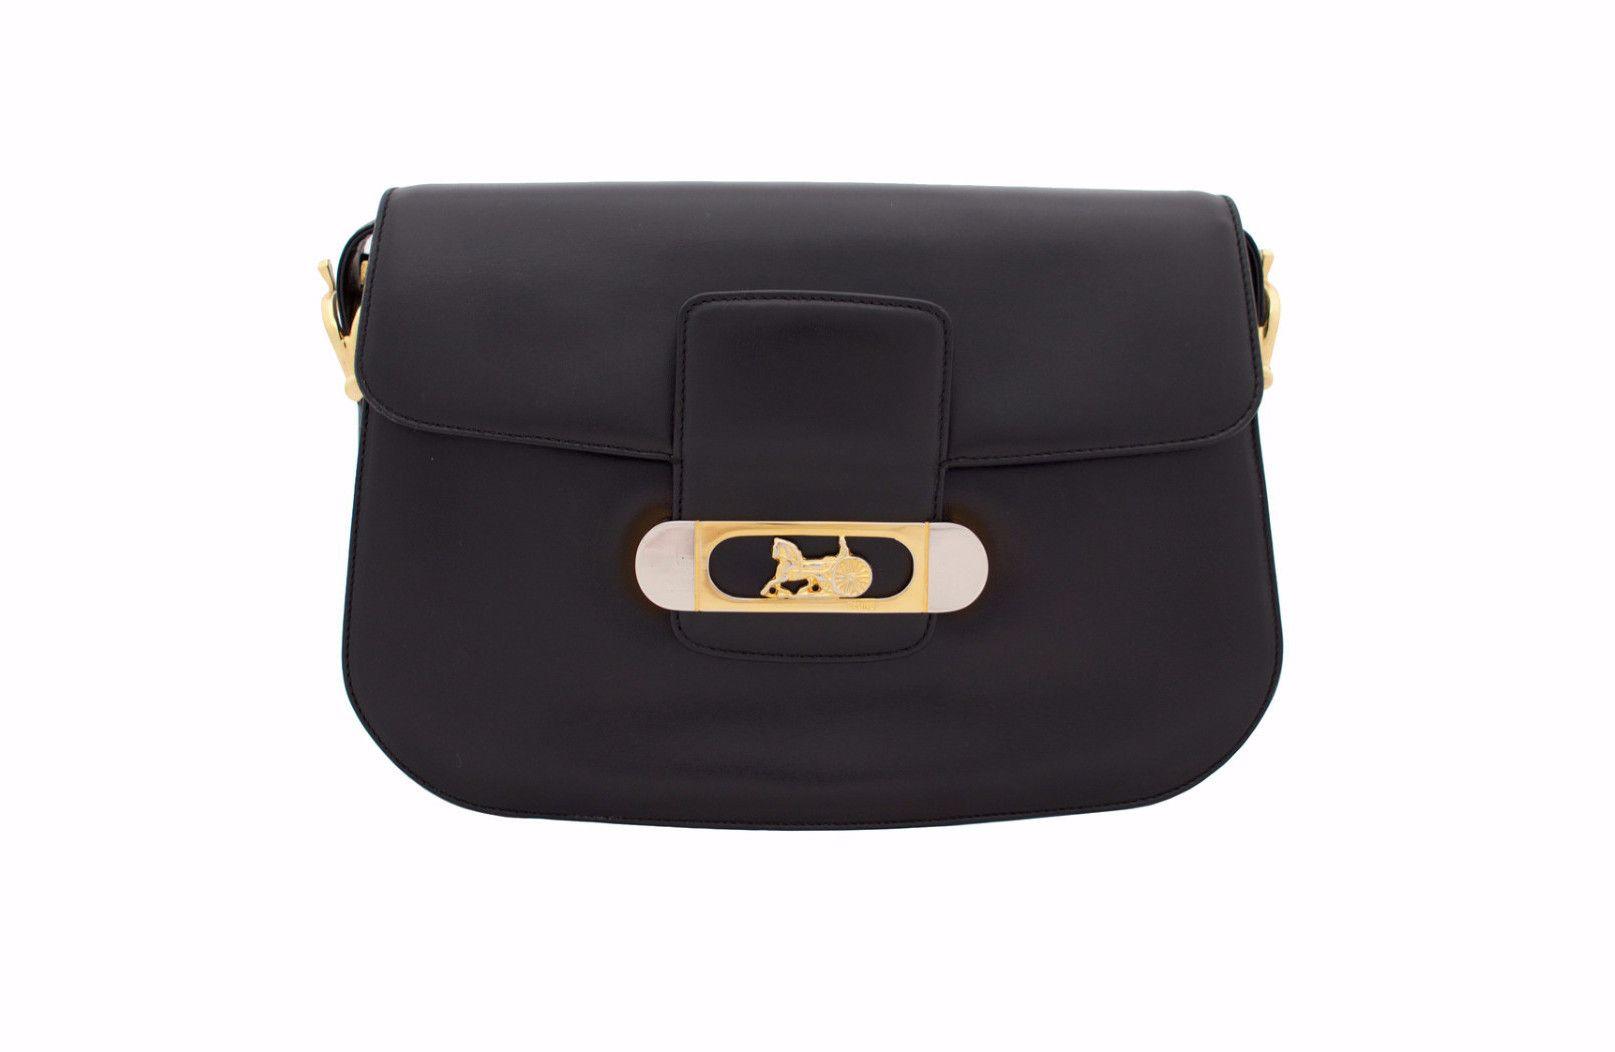 CELINE VINTAGE BAG - Box Black from Vintage District ee892ae30a364